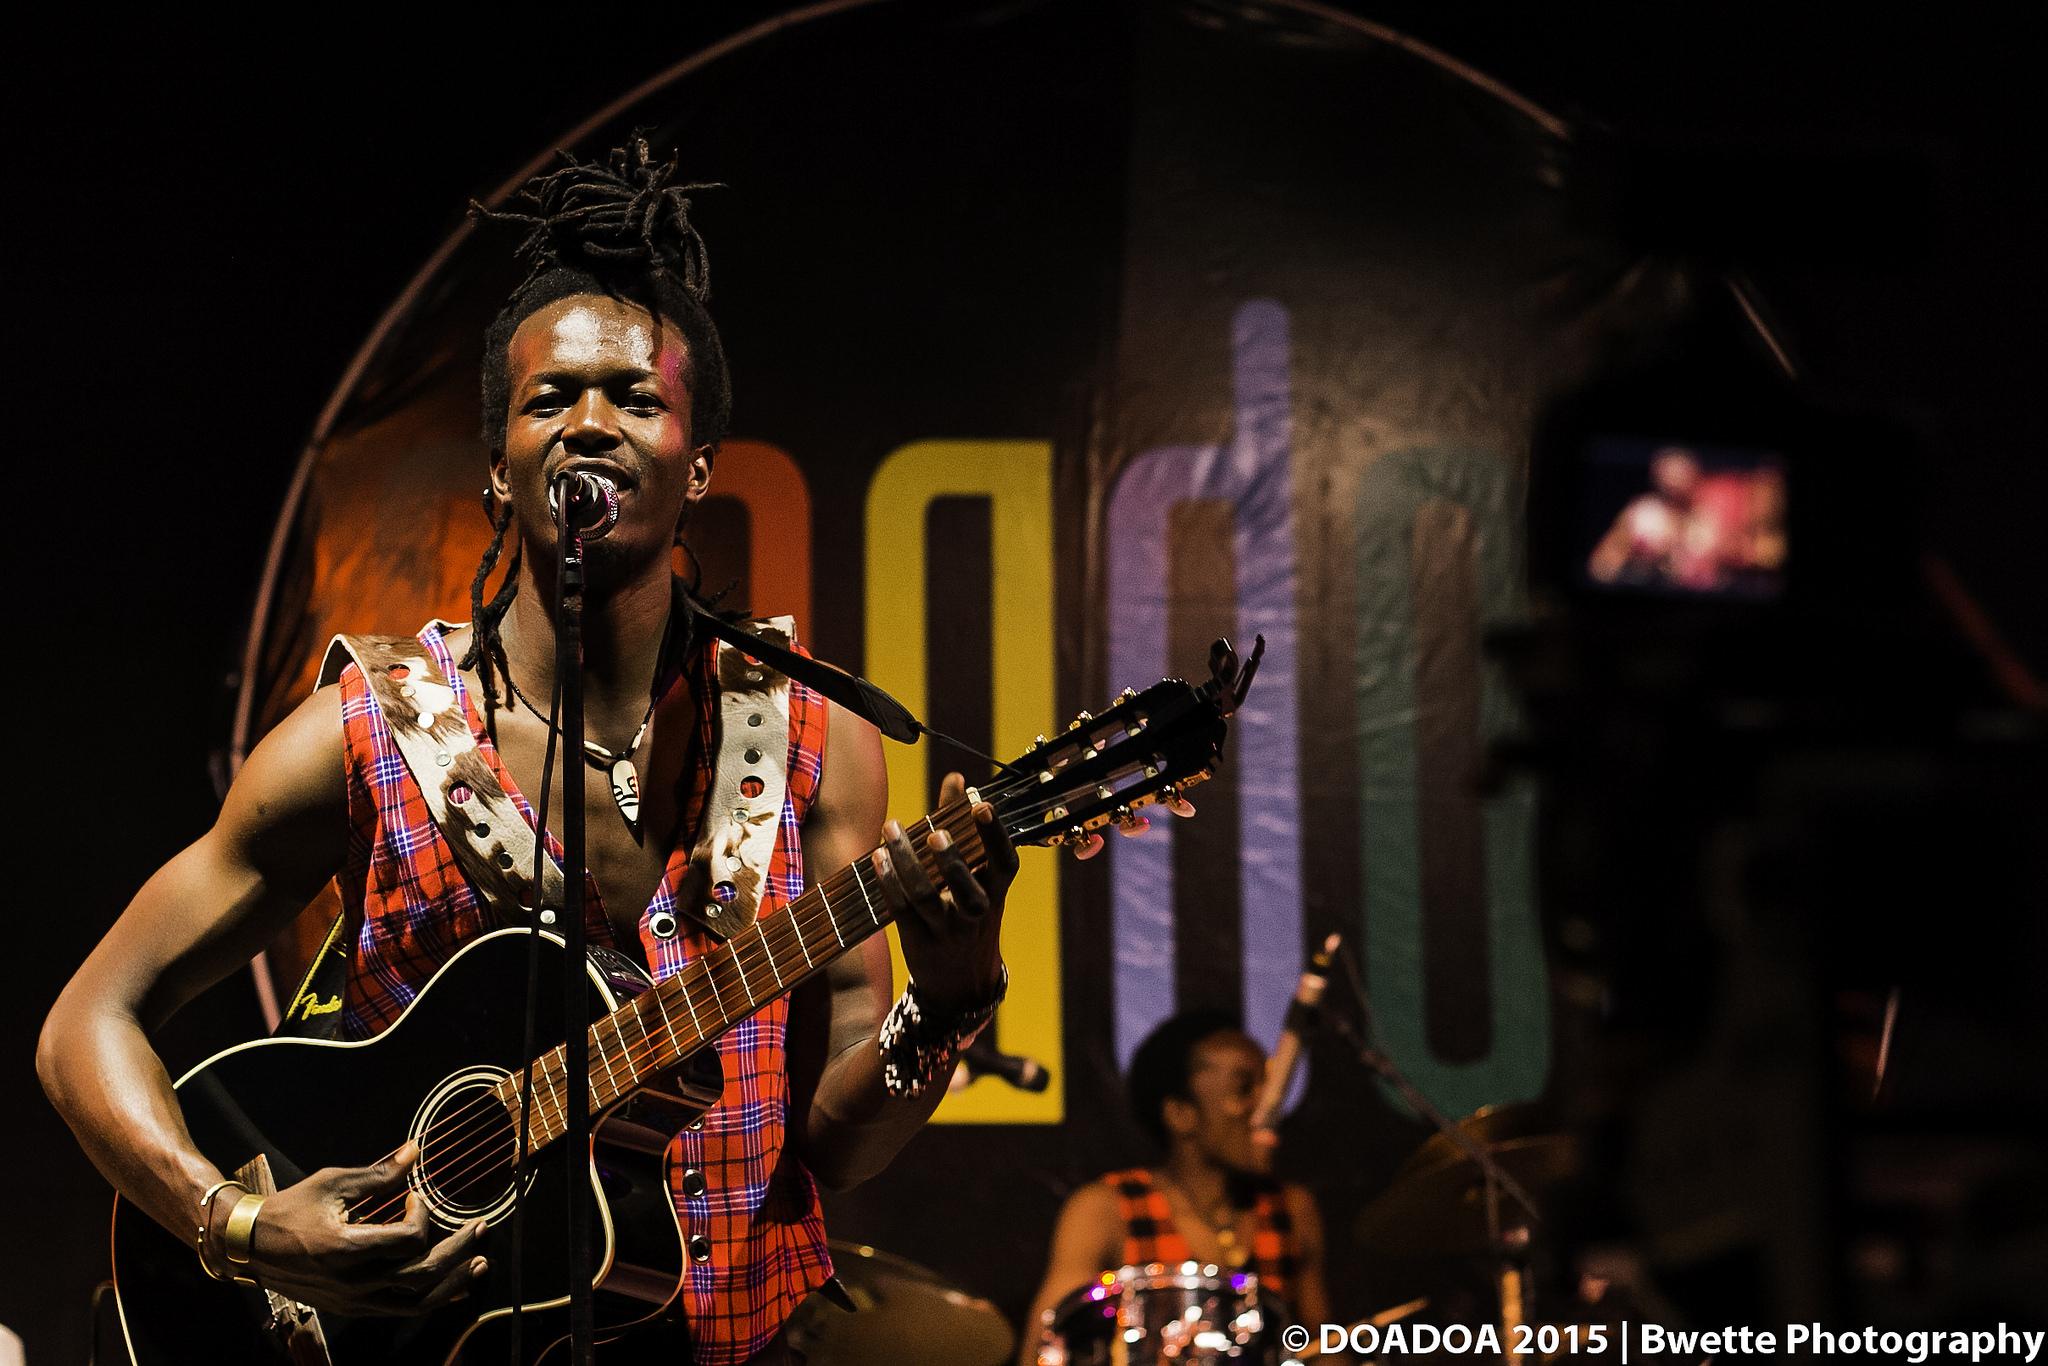 Isack Abeneko - Tausi